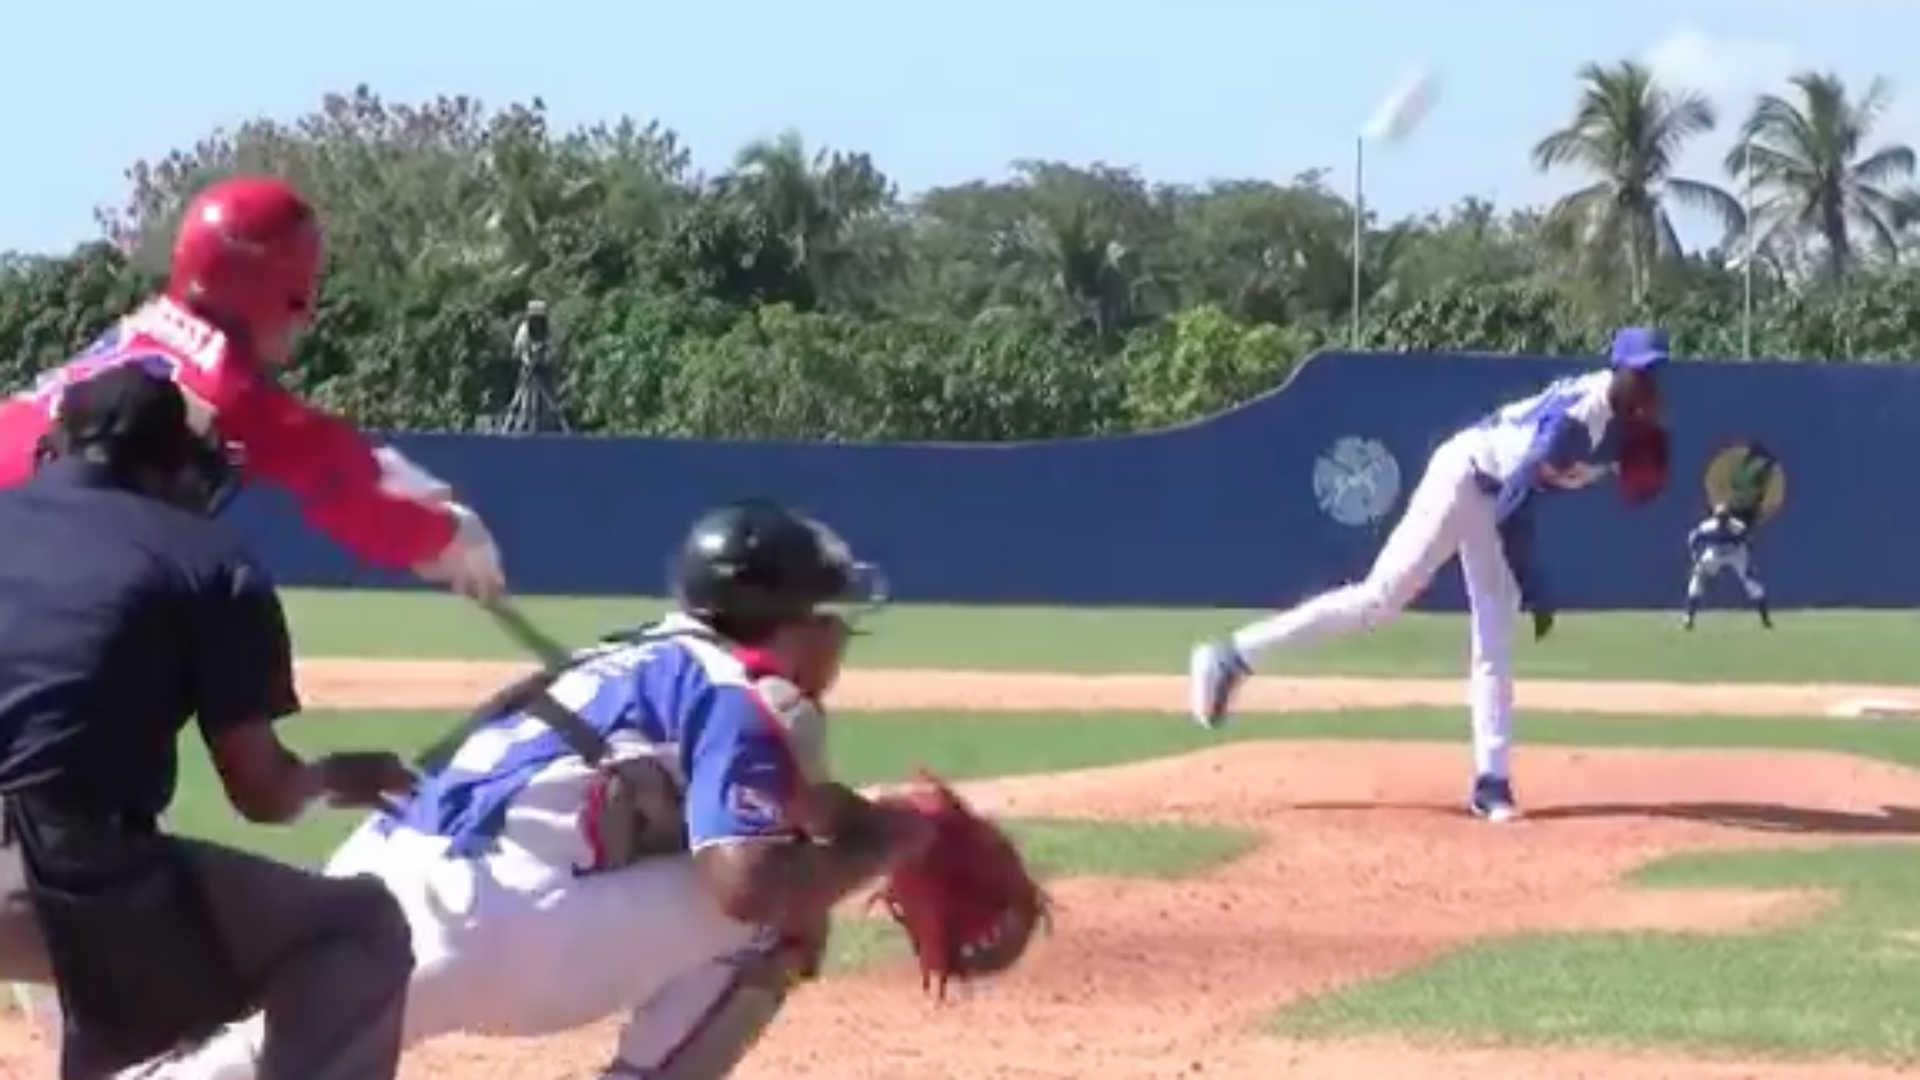 Dodgers sign hard-throwing Cuban pitcher Yadier Alvarez, 19